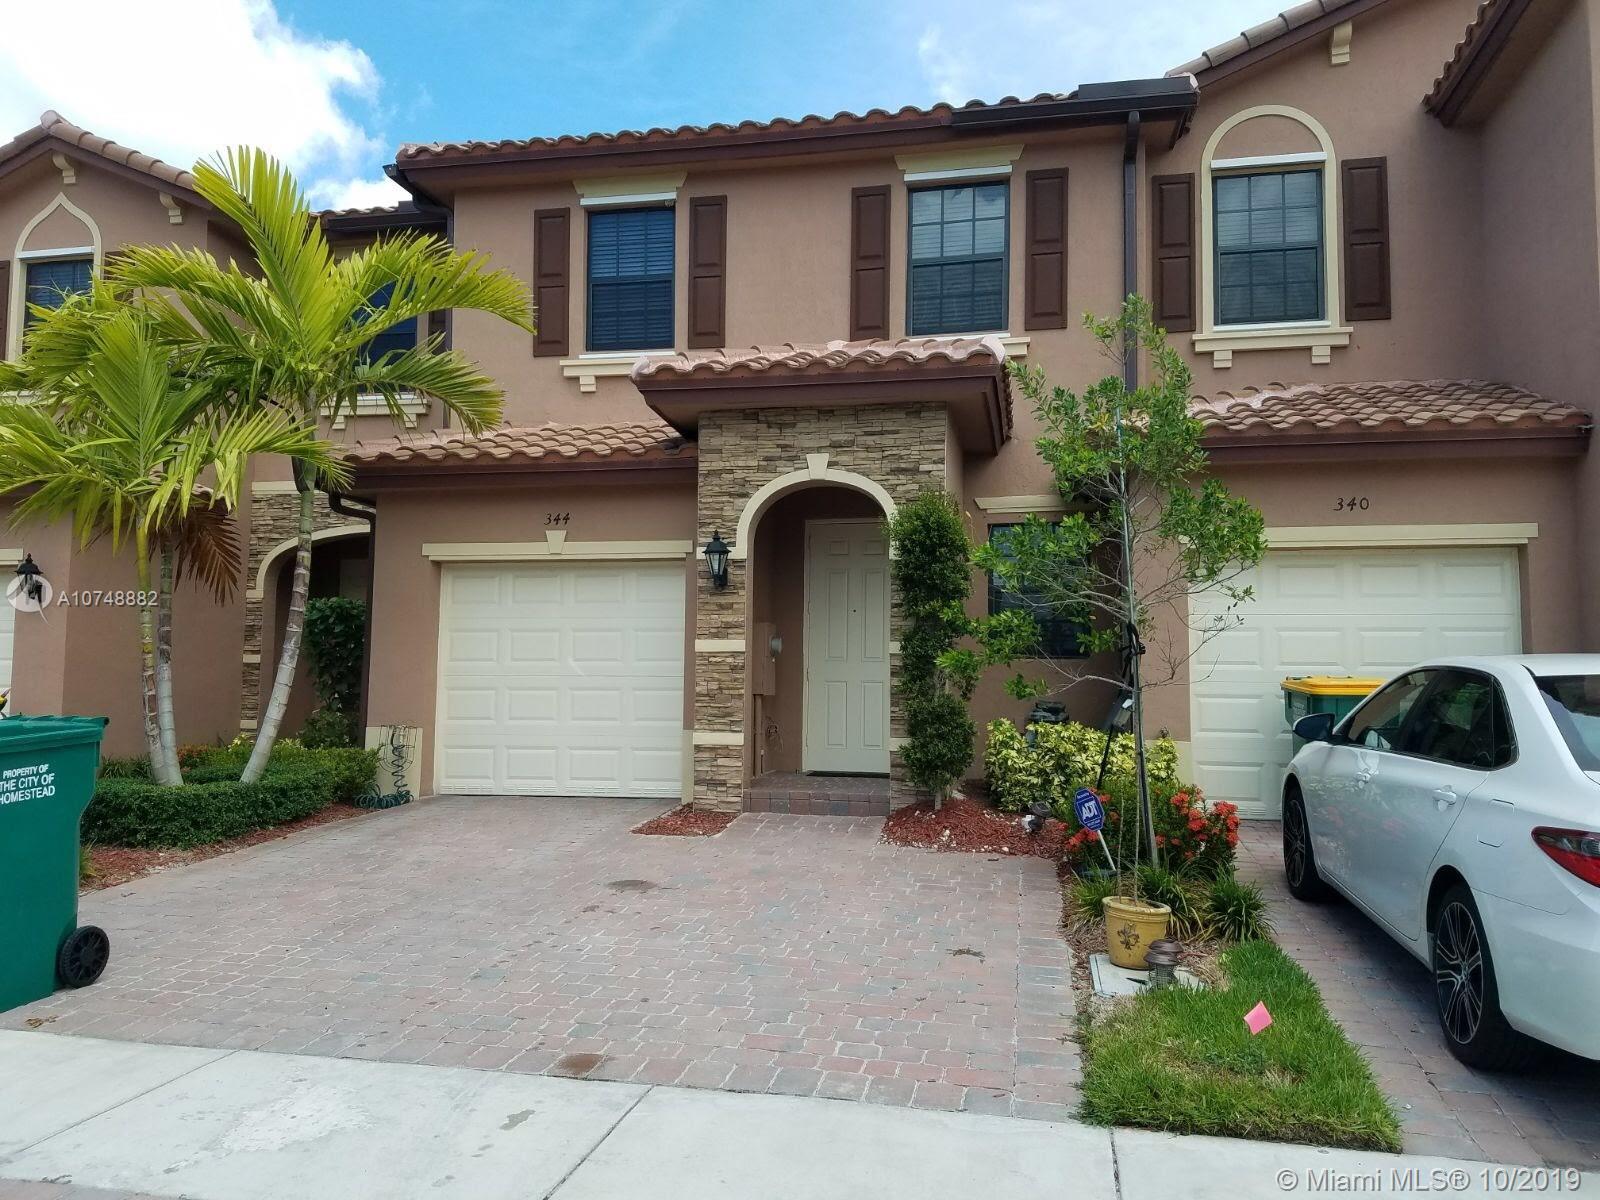 344 SE 37th Ter, Homestead, FL 33033 - Homestead, FL real estate listing